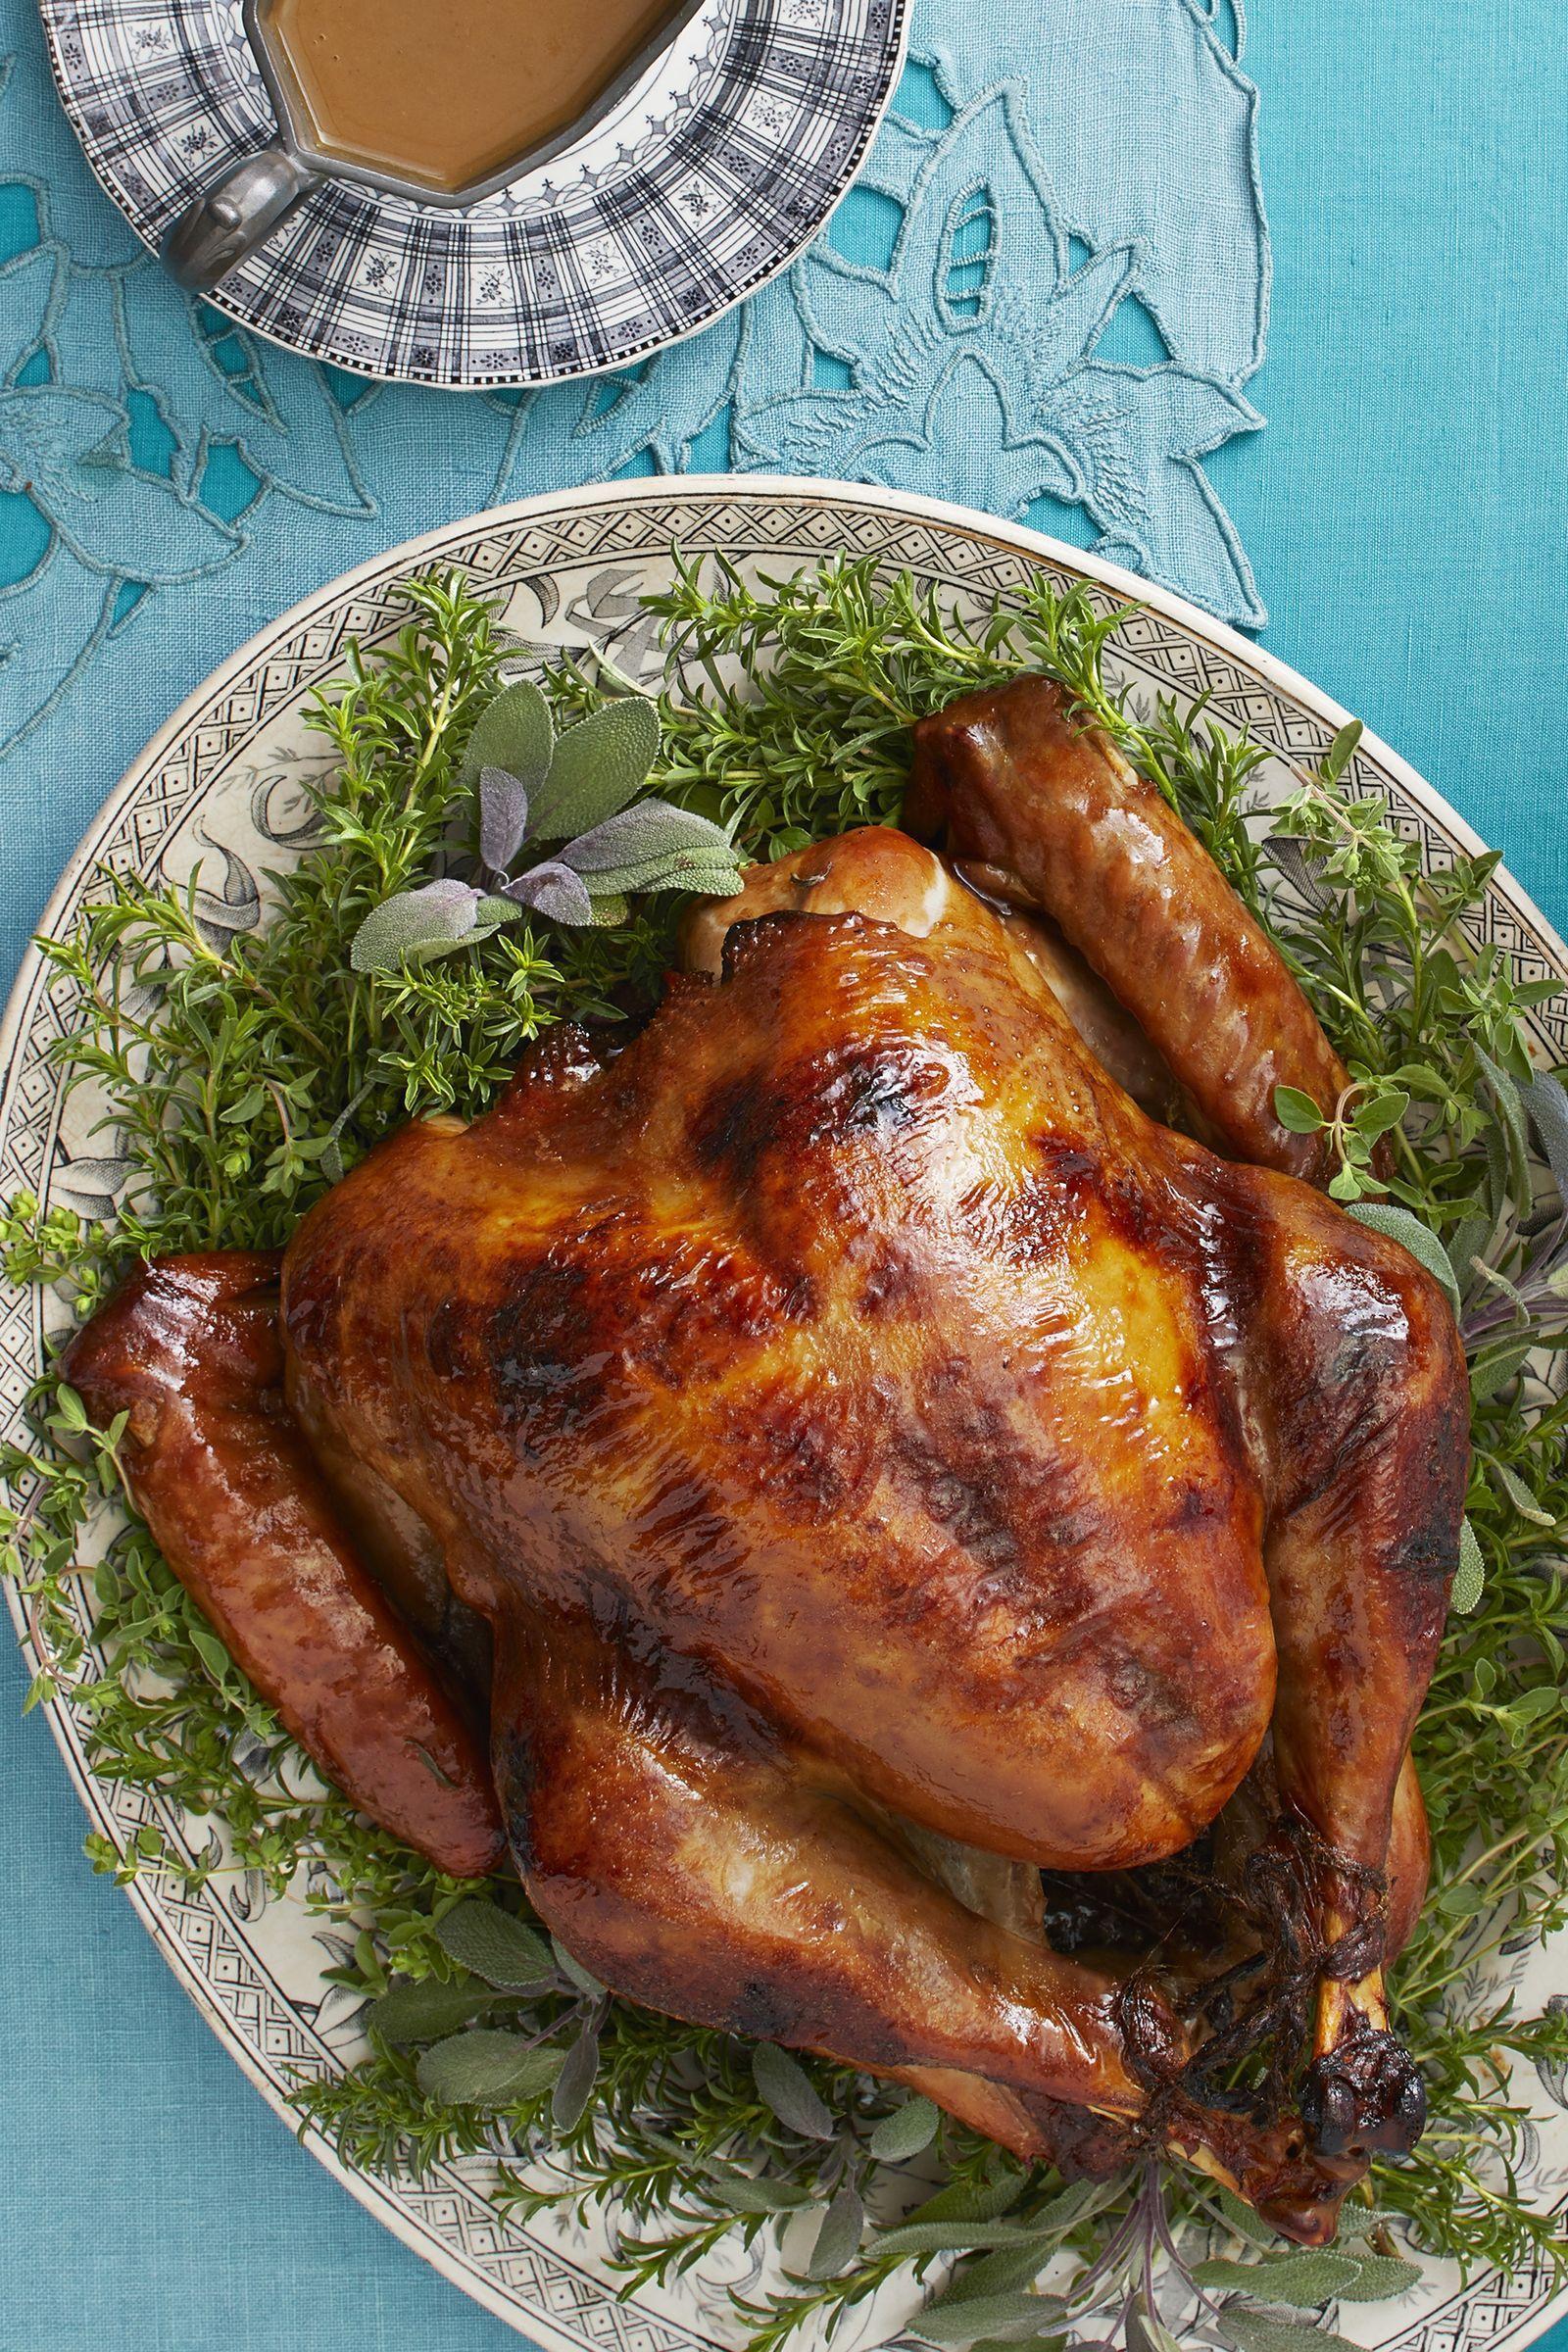 Try This Maple Rosemary Roast Turkey For Thanksgiving Dinner Recipe Roasted Turkey Turkey Recipes Thanksgiving Roast Turkey Recipes